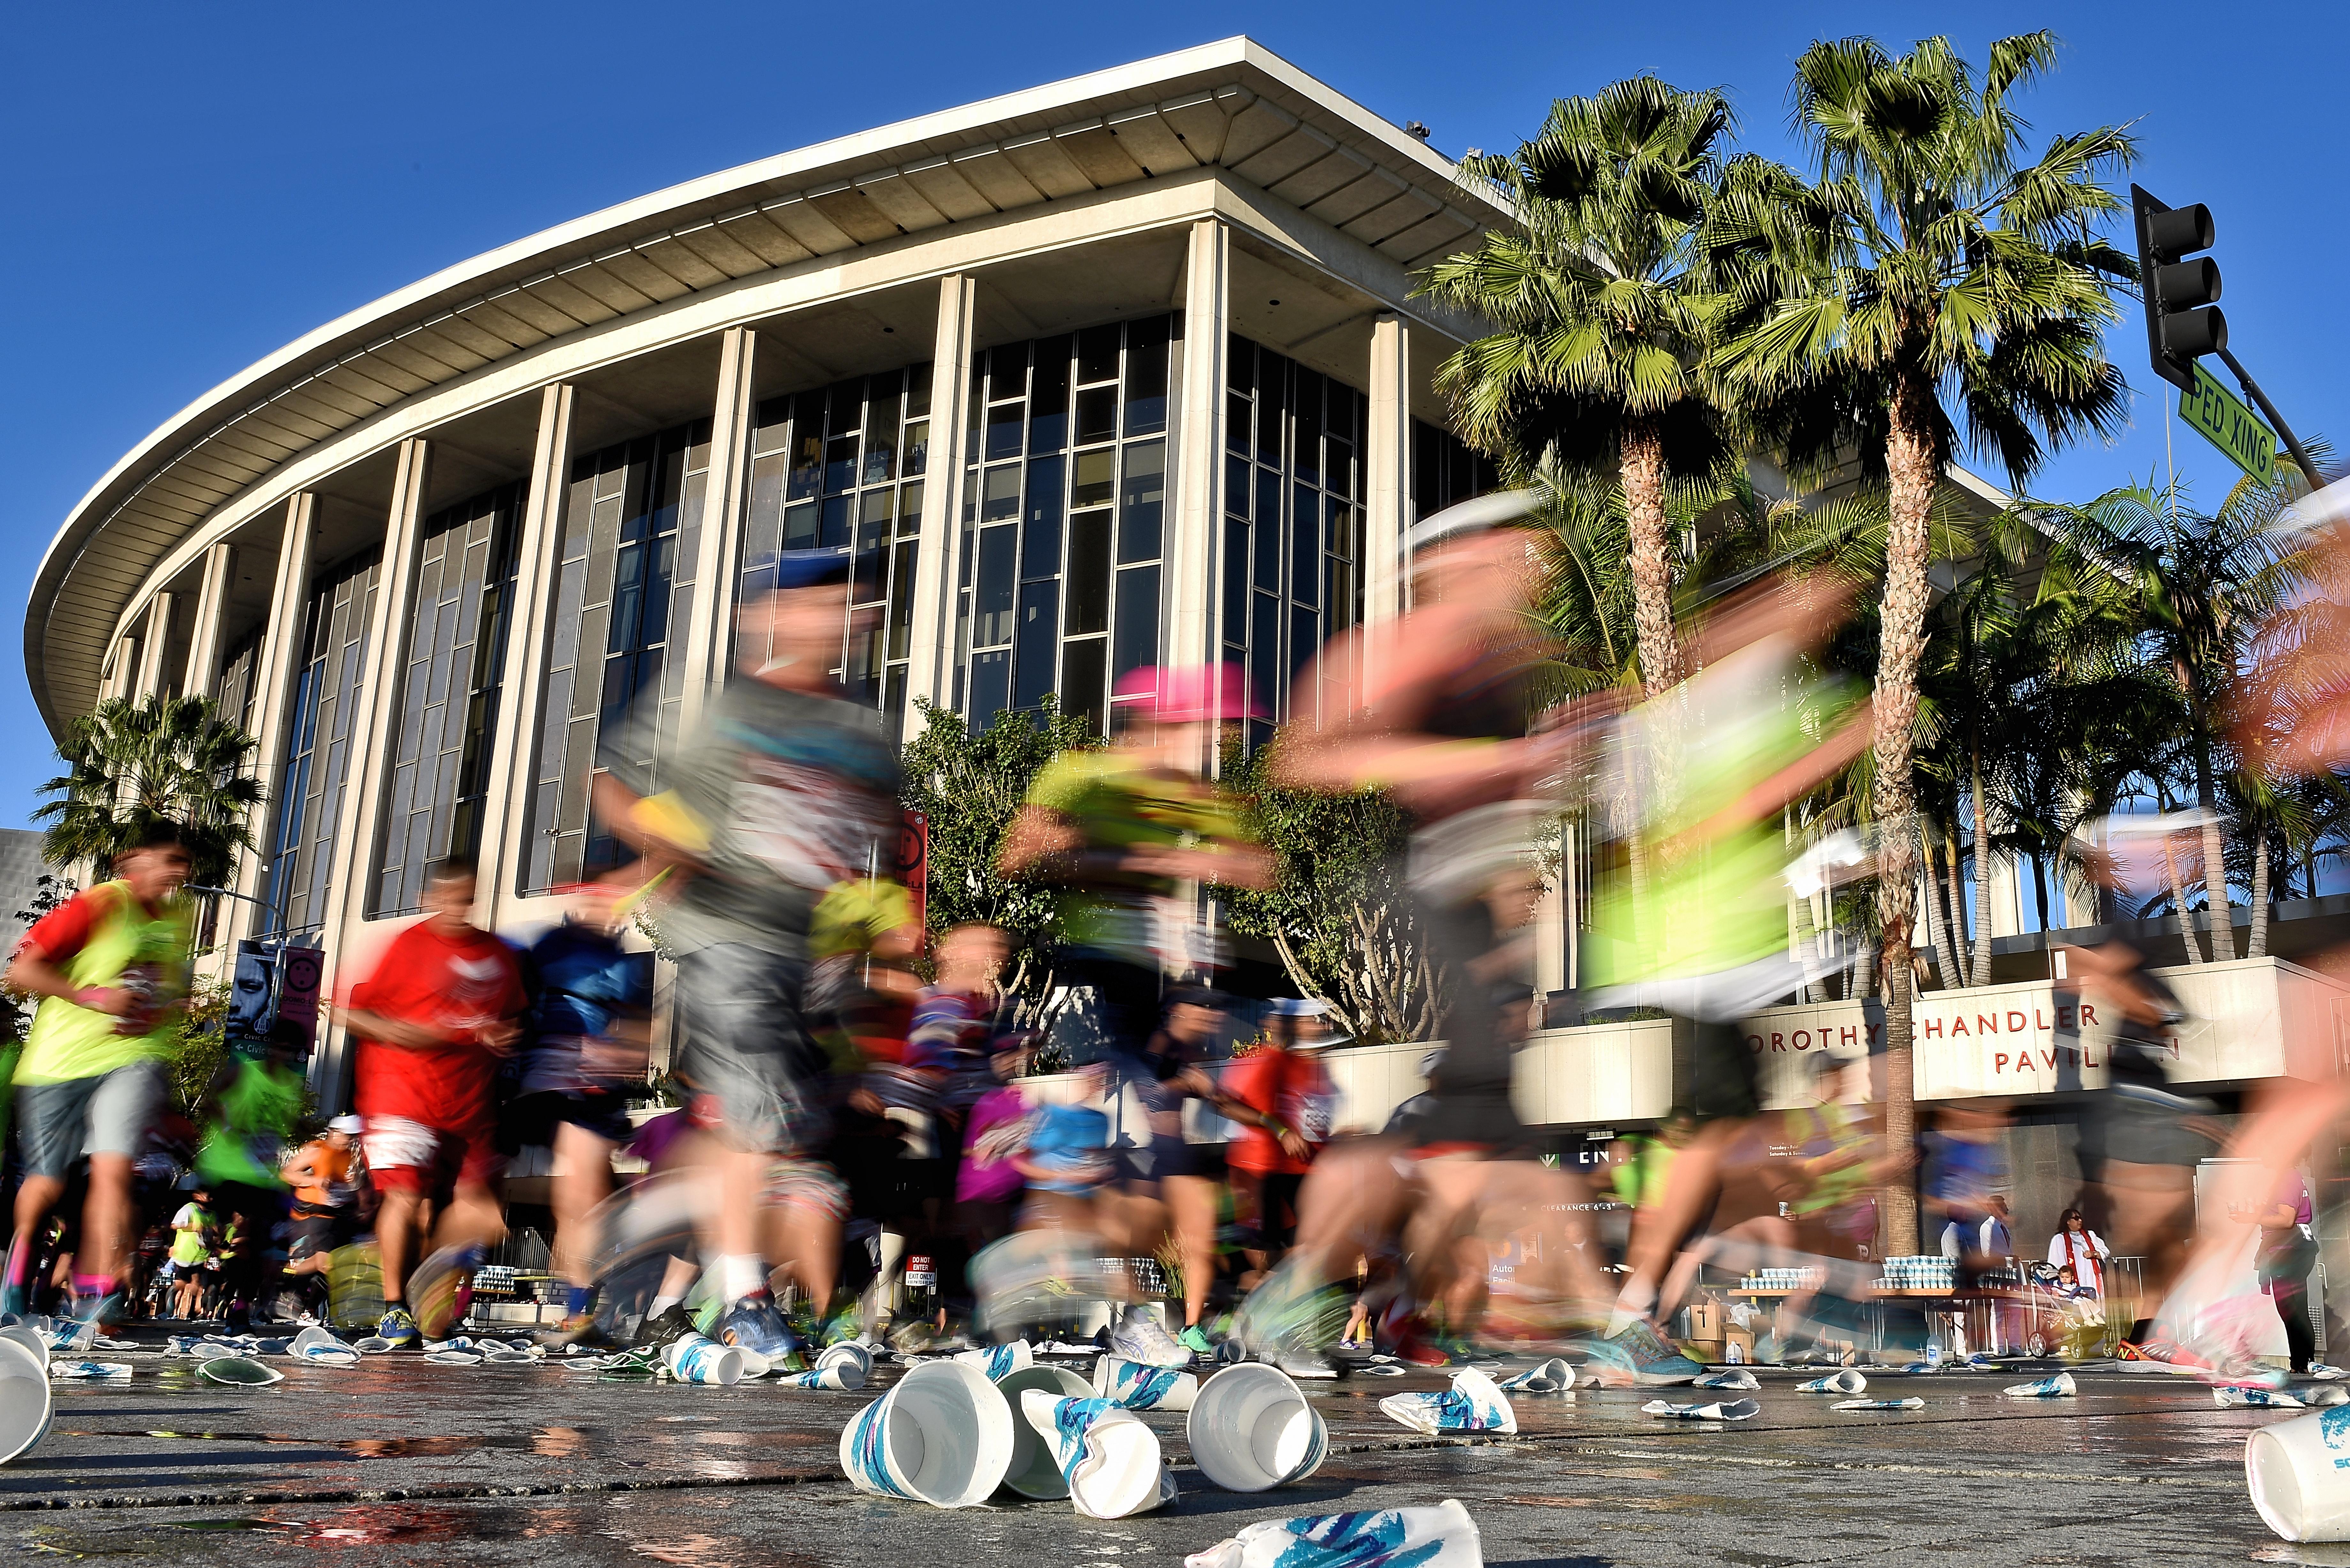 How to get around during the LA Marathon